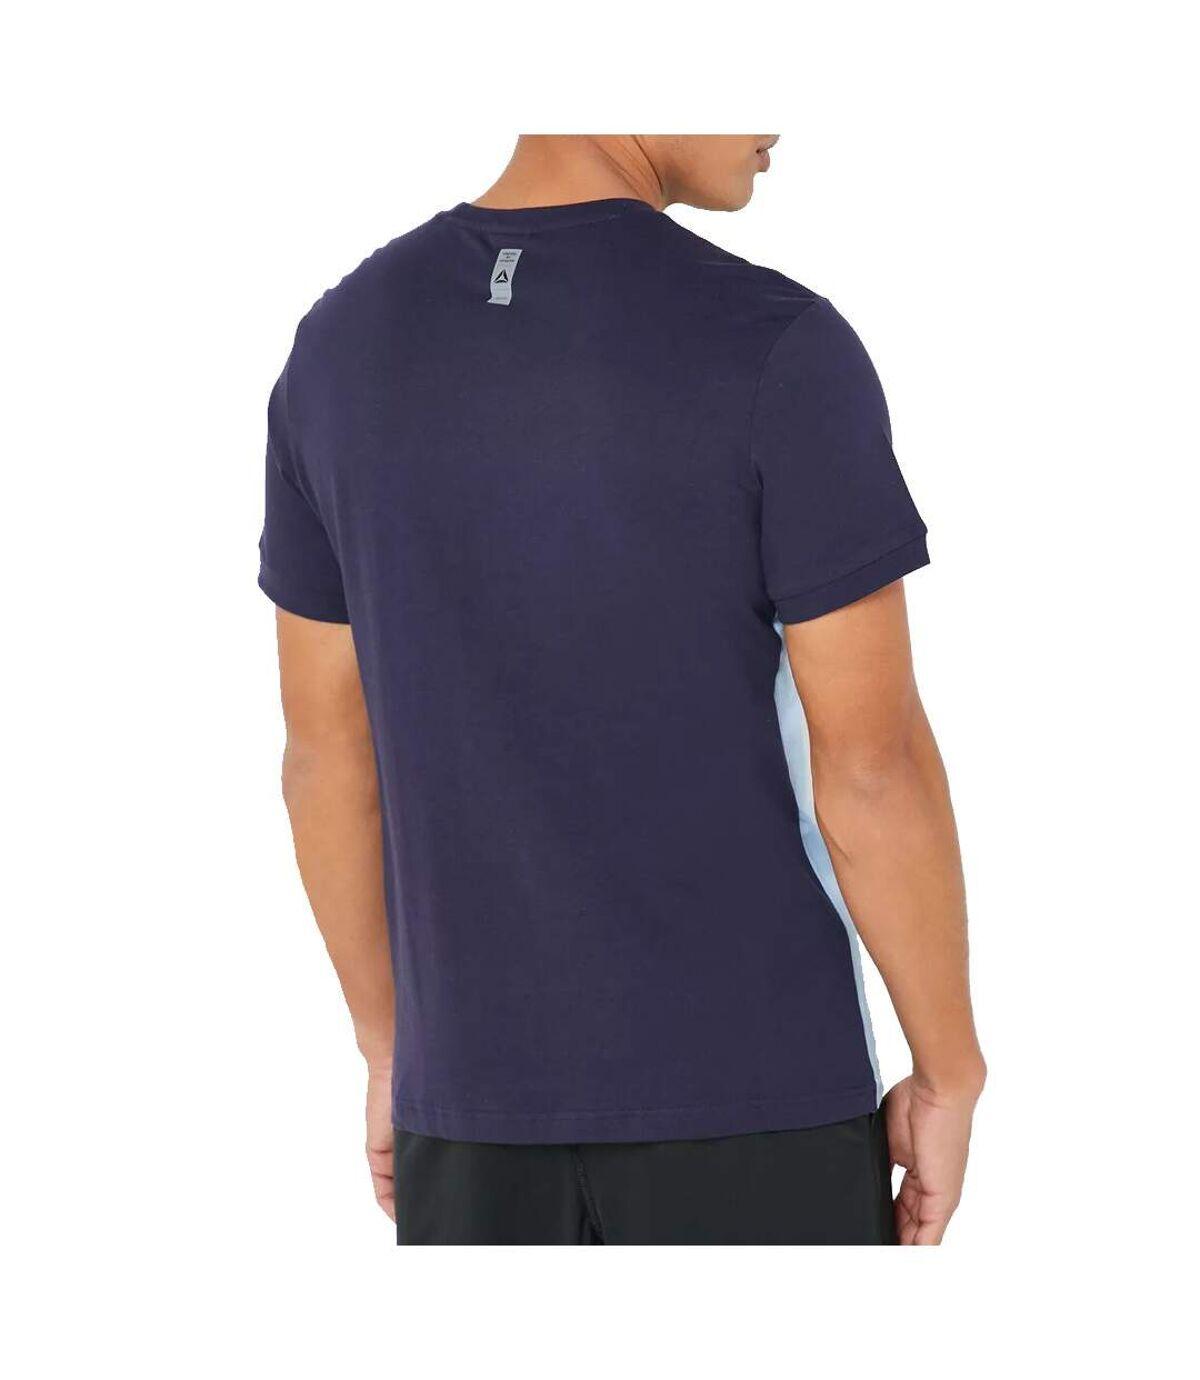 T-shirt bleu homme Reebok Les Mills